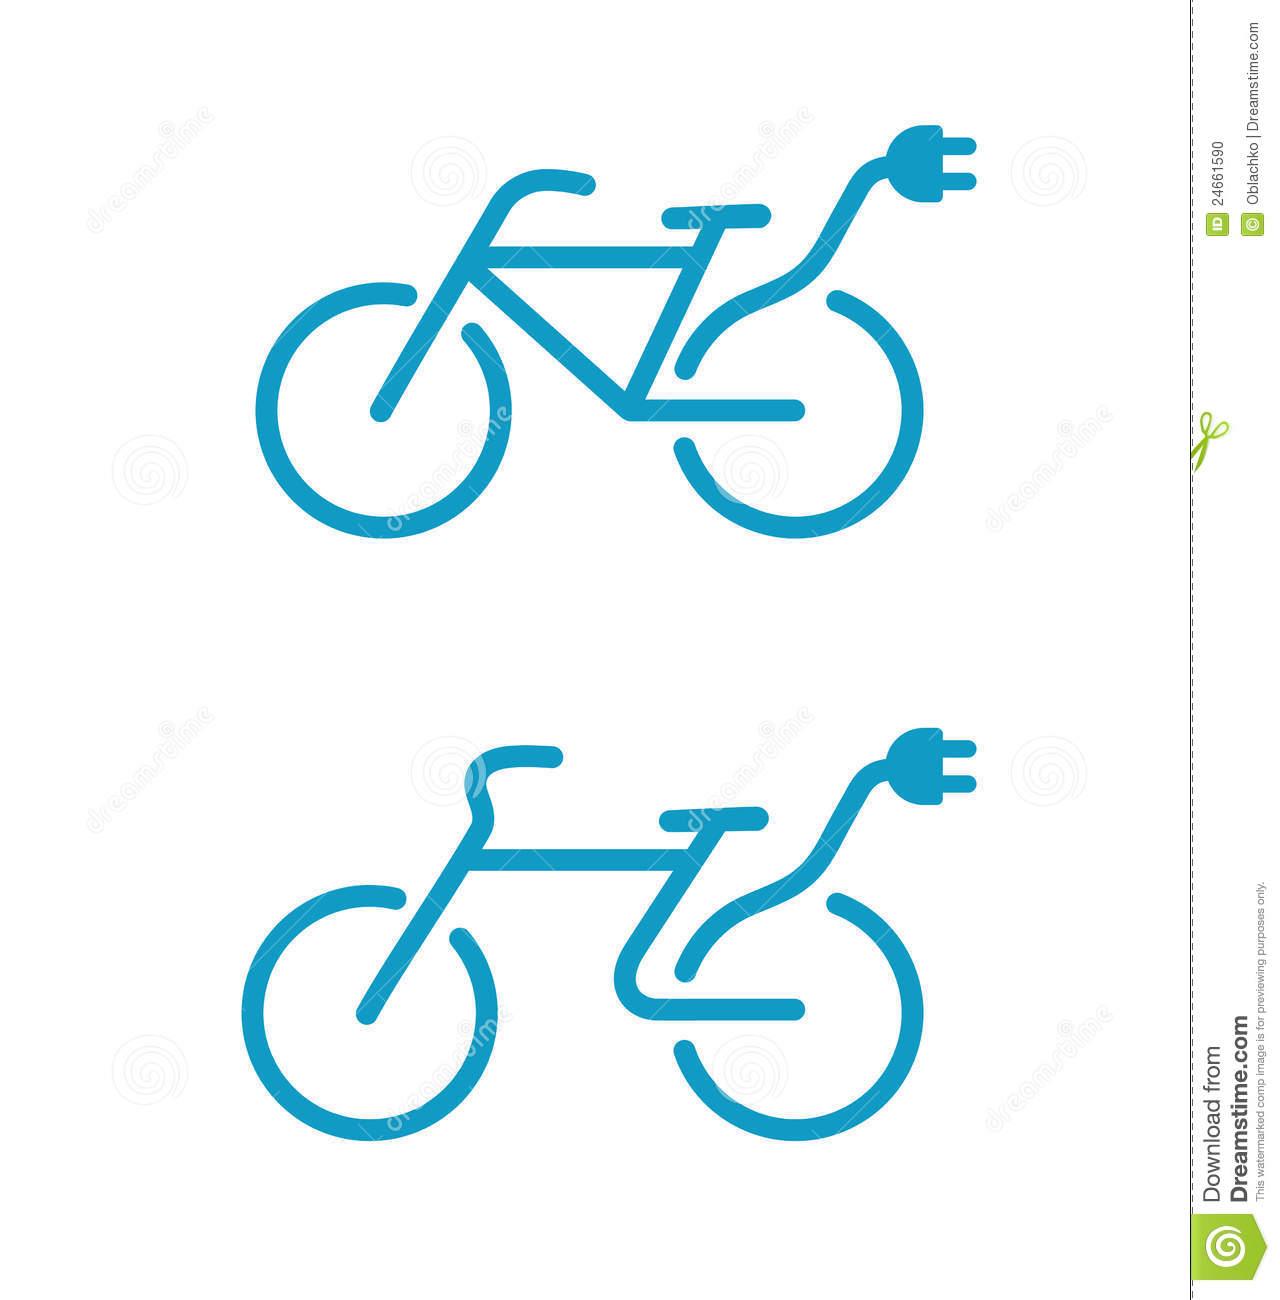 Storm Electric Bike >> Electric bike clipart - Clipground